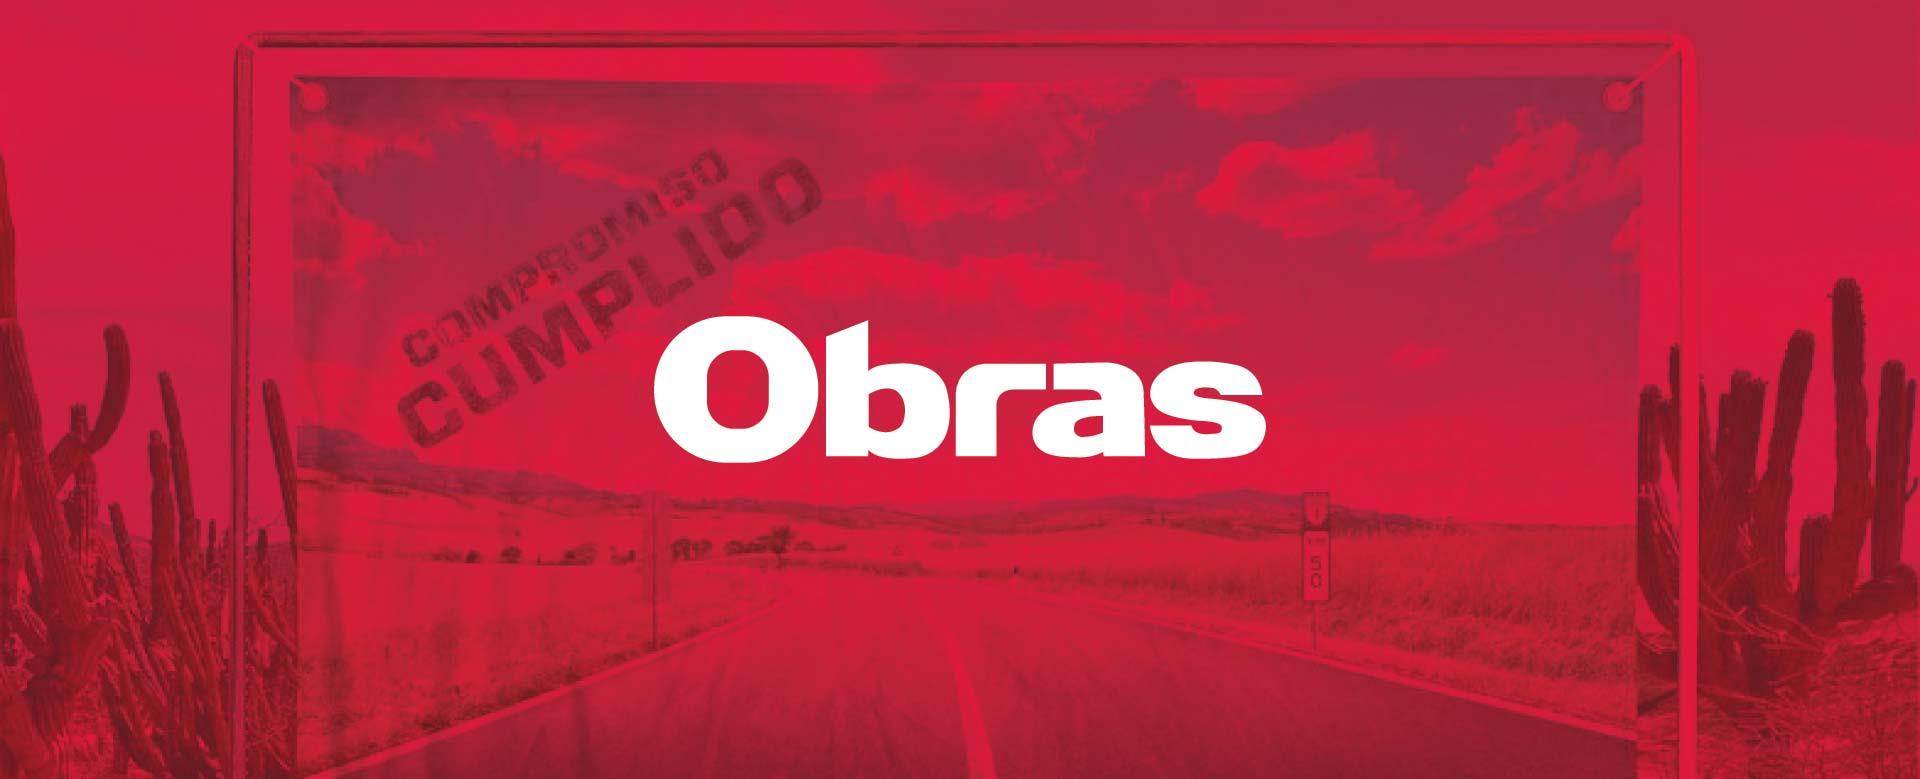 Obras bg Mexico